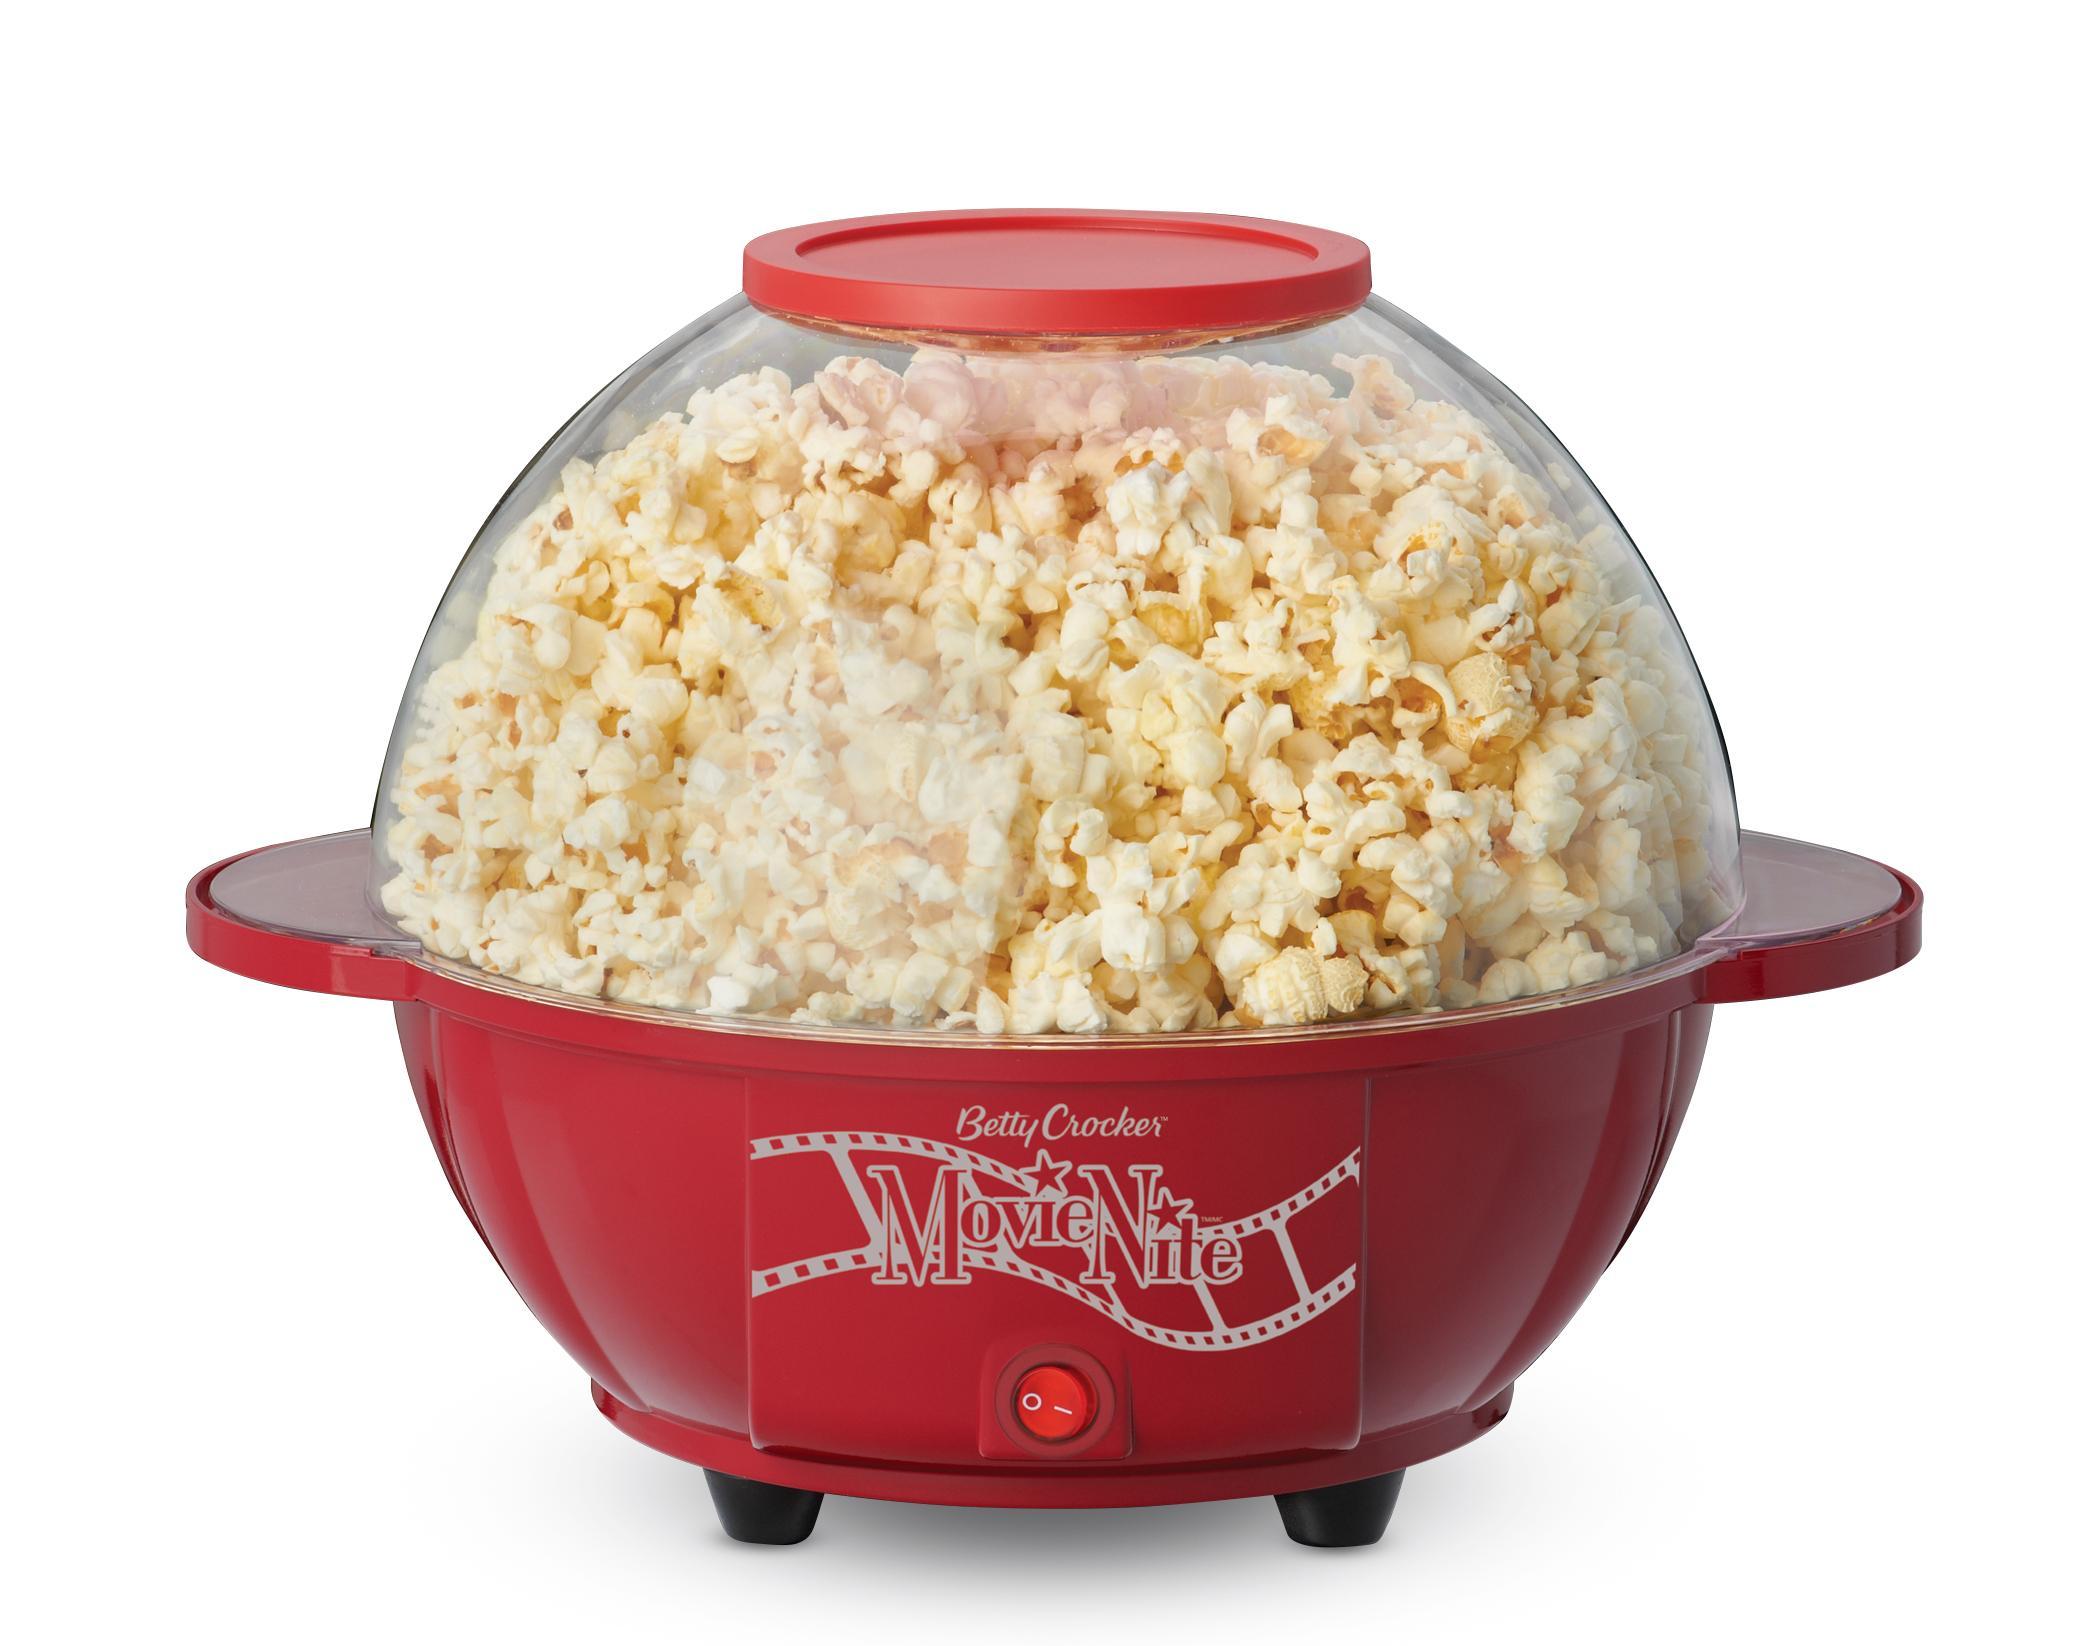 Amazon.com: Betty Crocker BC-2970CR Cinema-Style Popcorn